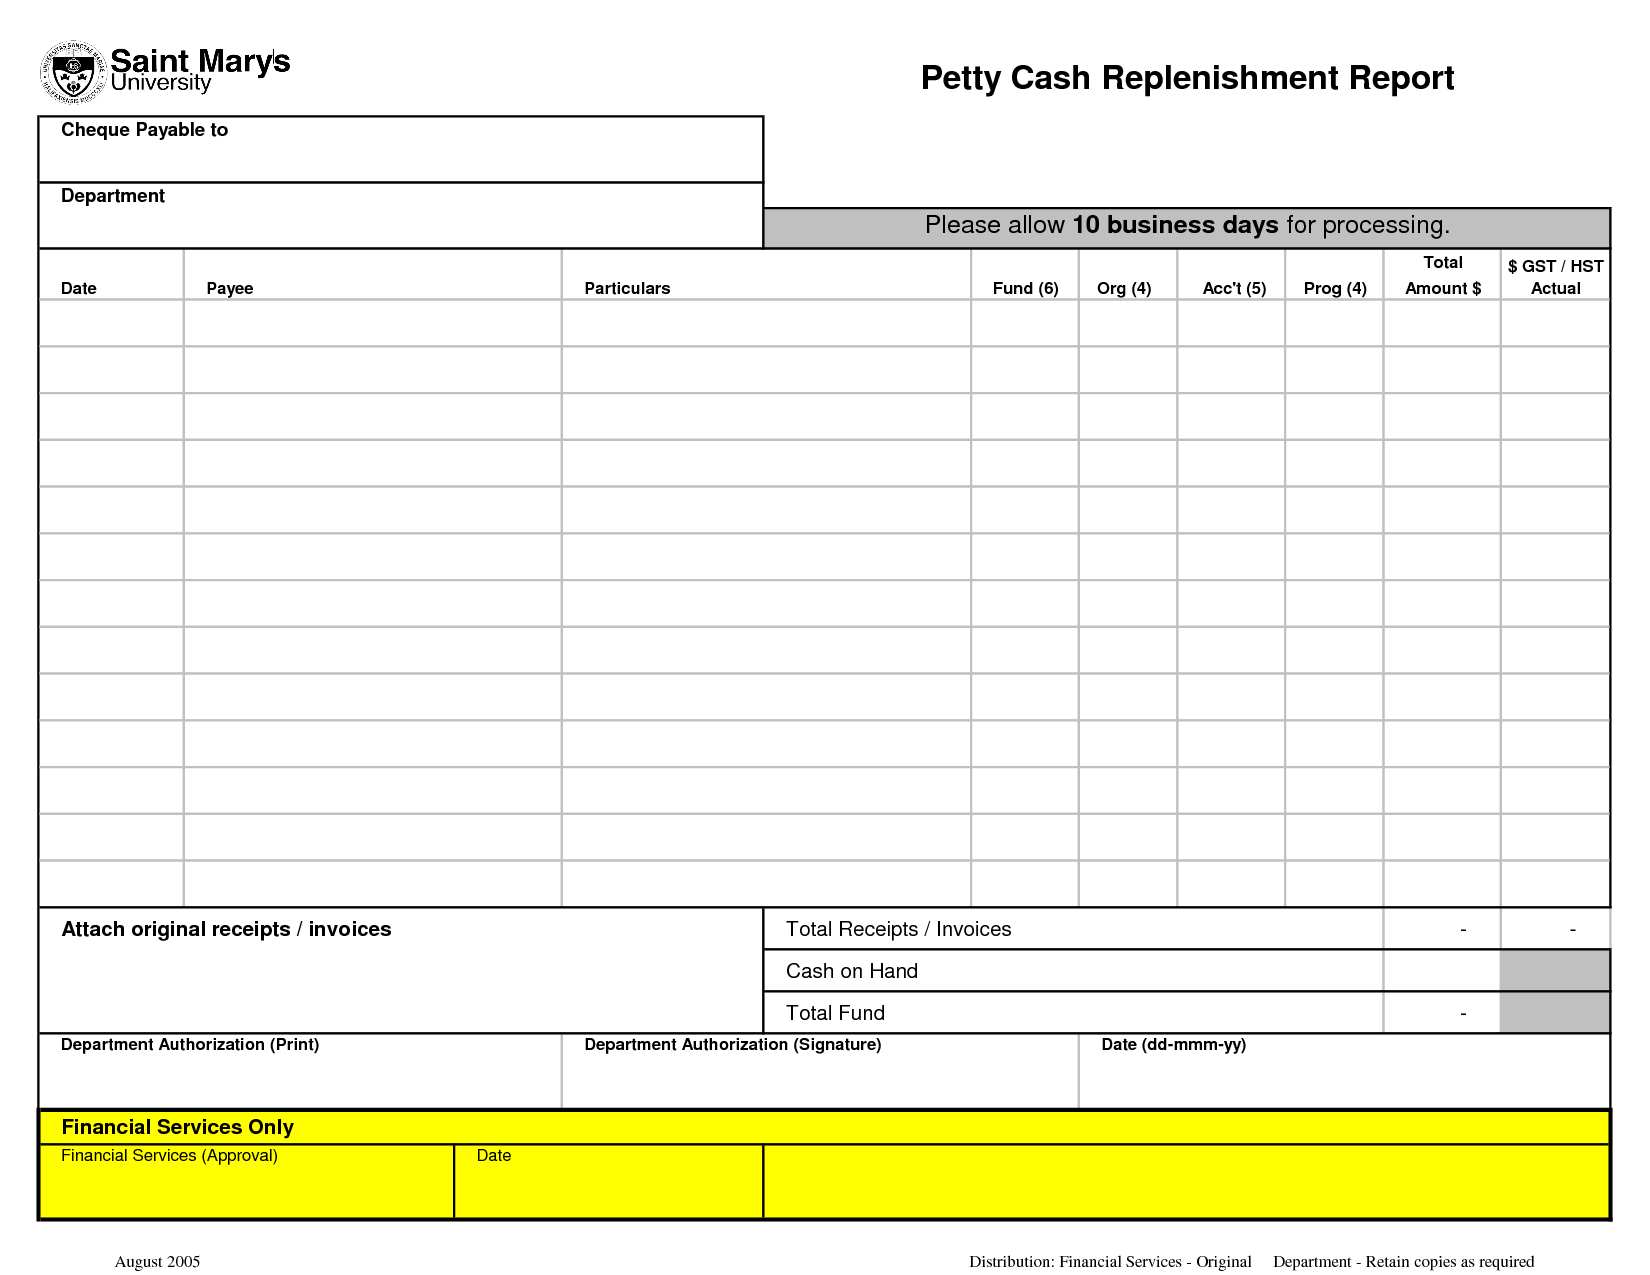 Petty Cash Voucher Template Portablegasgrillweber Example Of - Free Printable Petty Cash Voucher